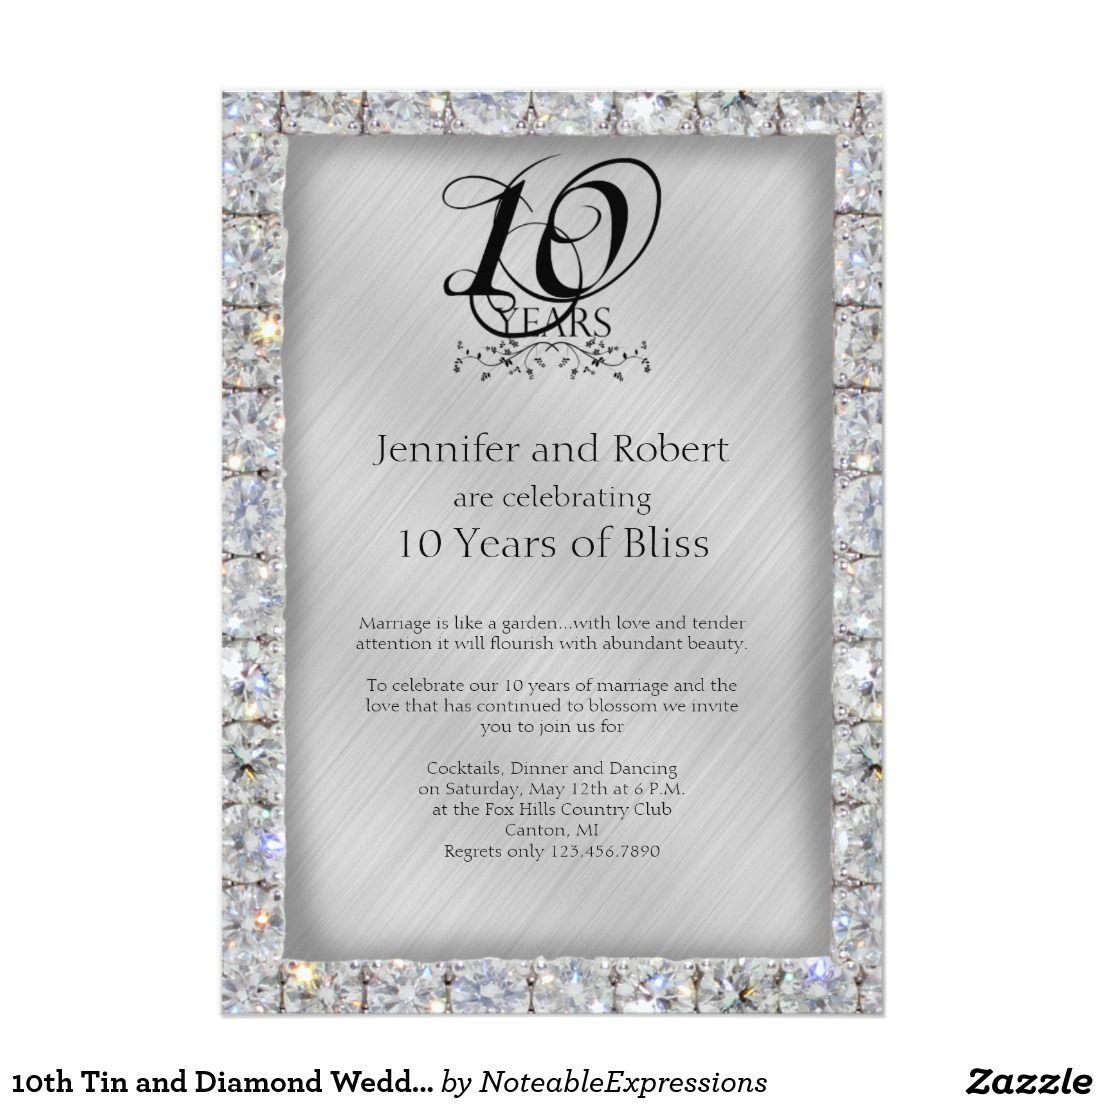 50th Wedding Anniversary Gift Etiquette: 10th Tin And Diamond Wedding Anniversary Invitation